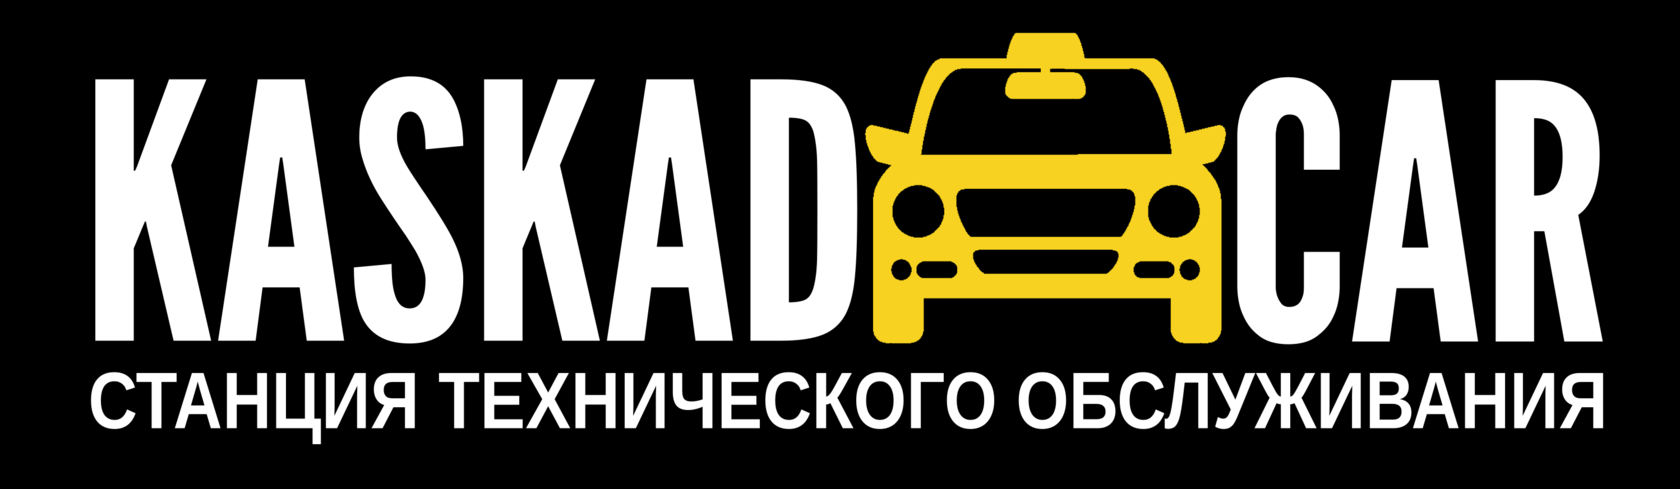 СТО KASKAD CAR